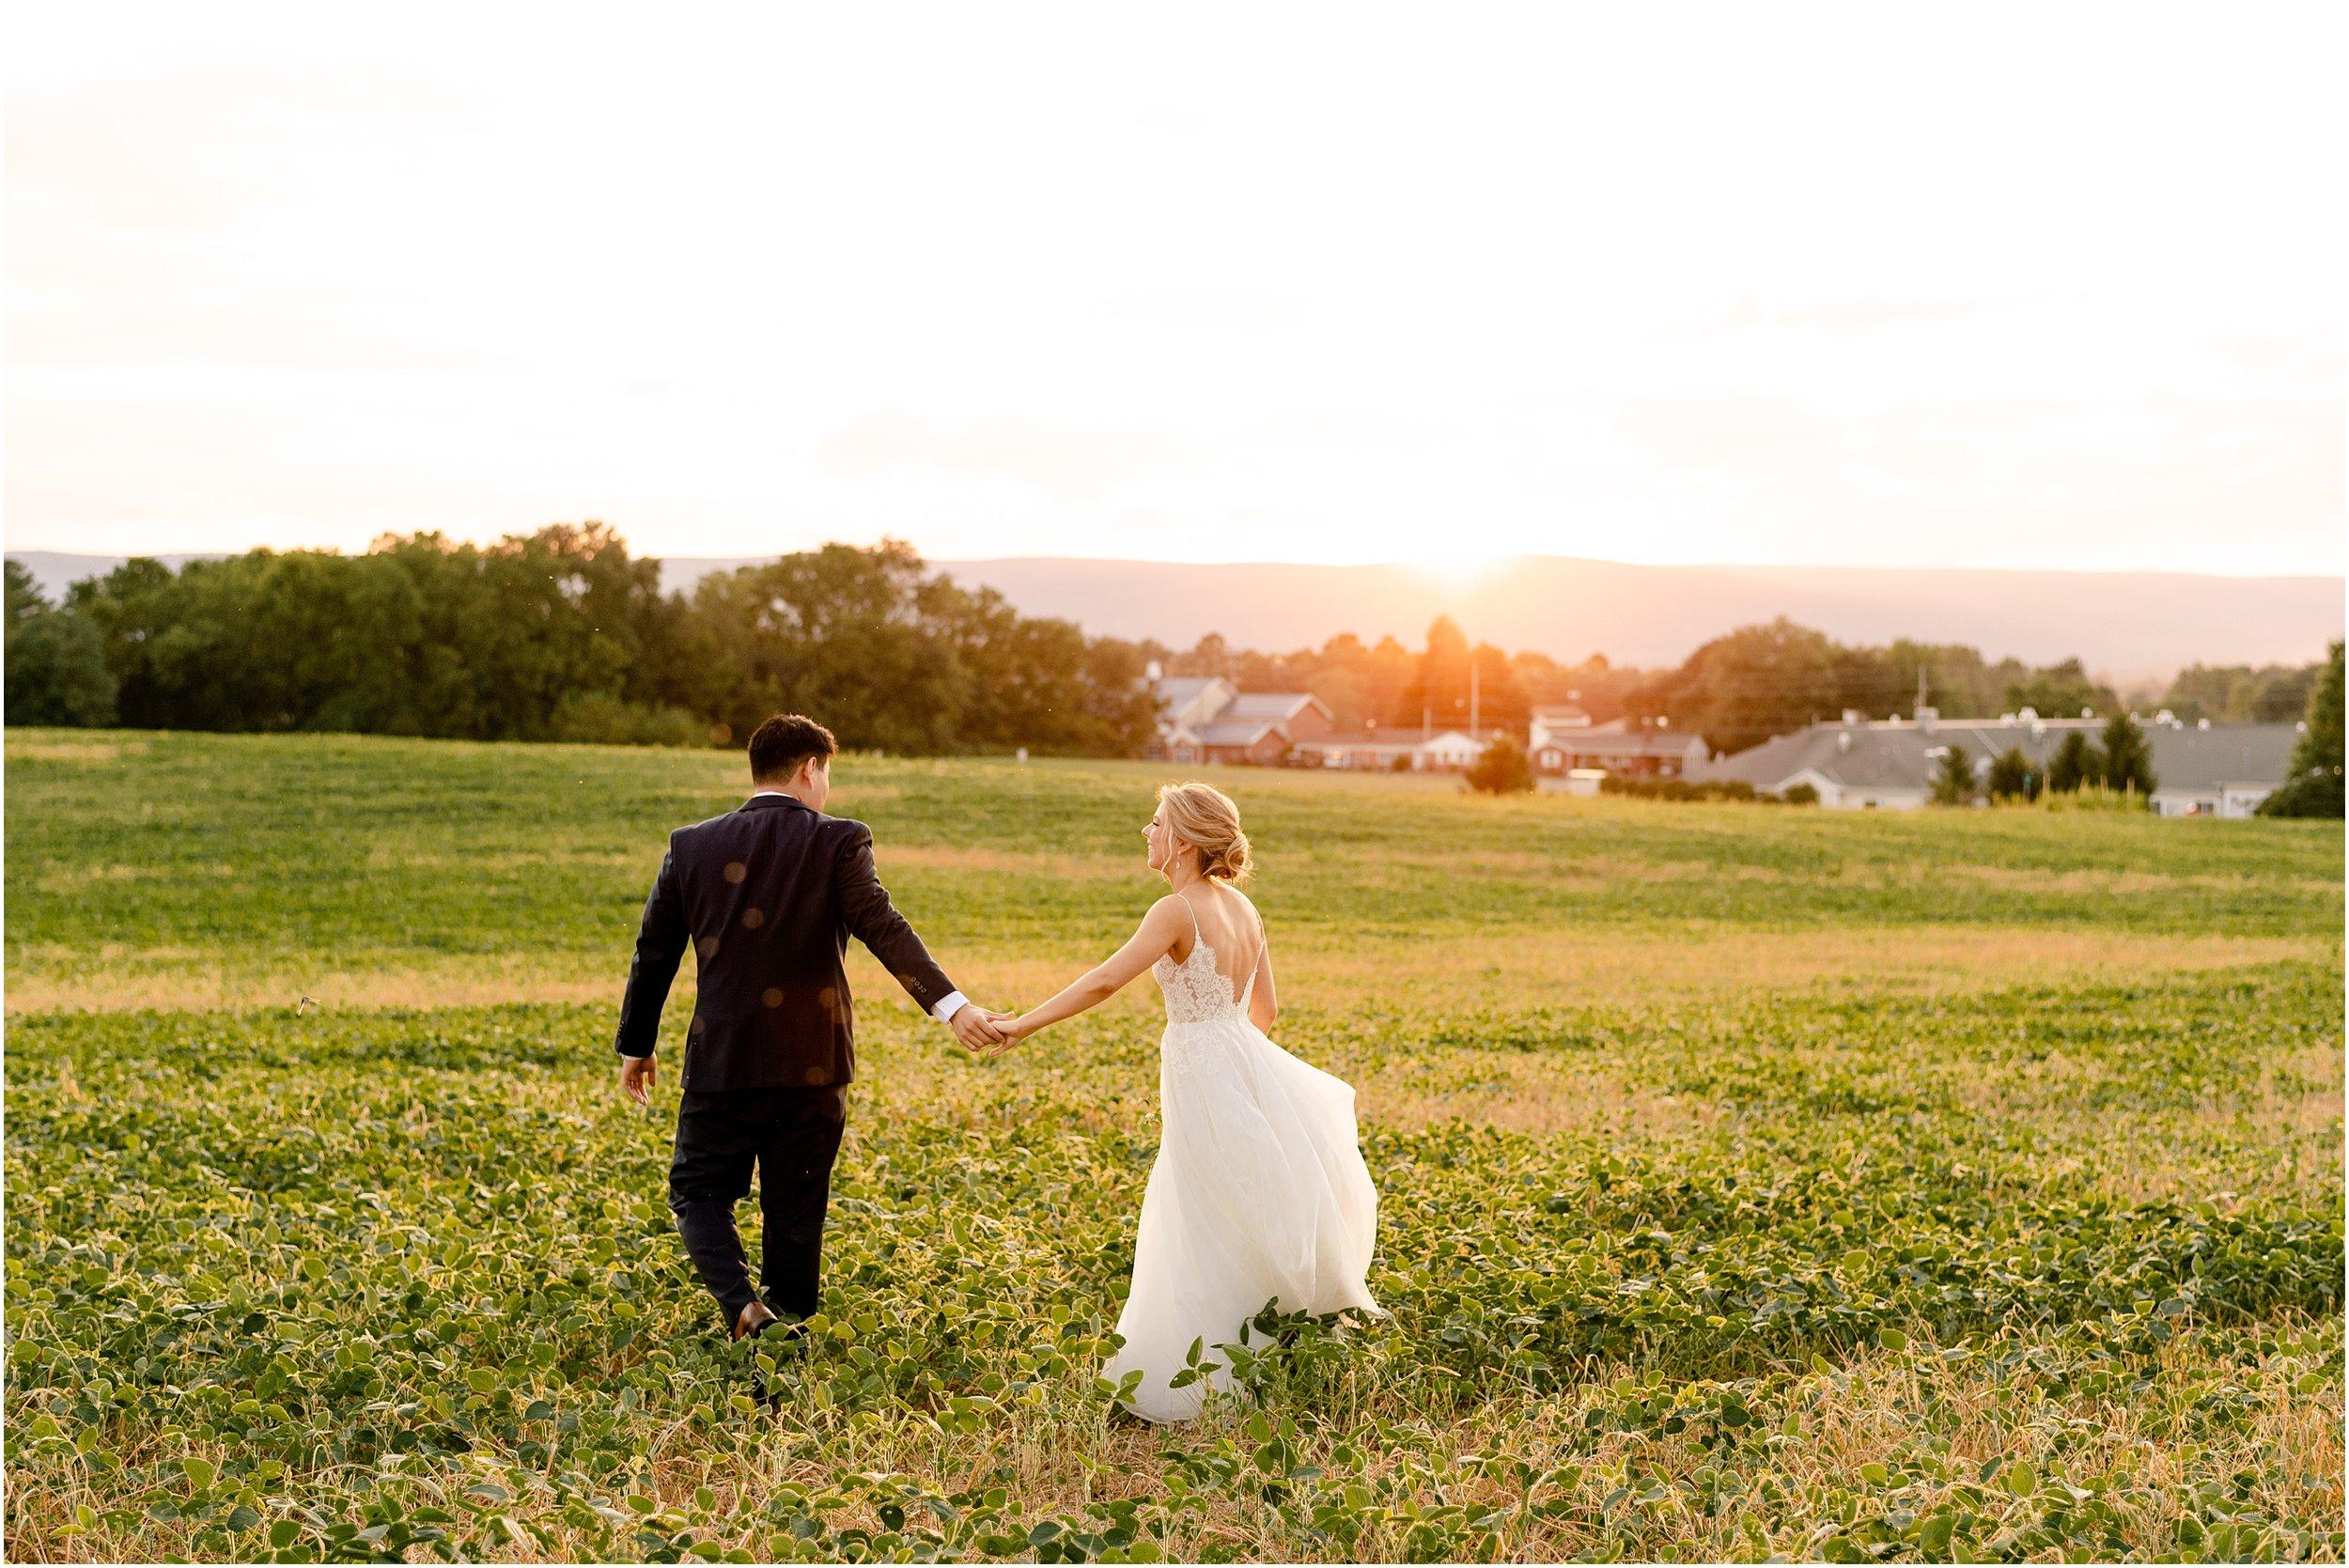 hannah leigh photography Walkers Overlook Wedding Walkersville MD_3567.jpg